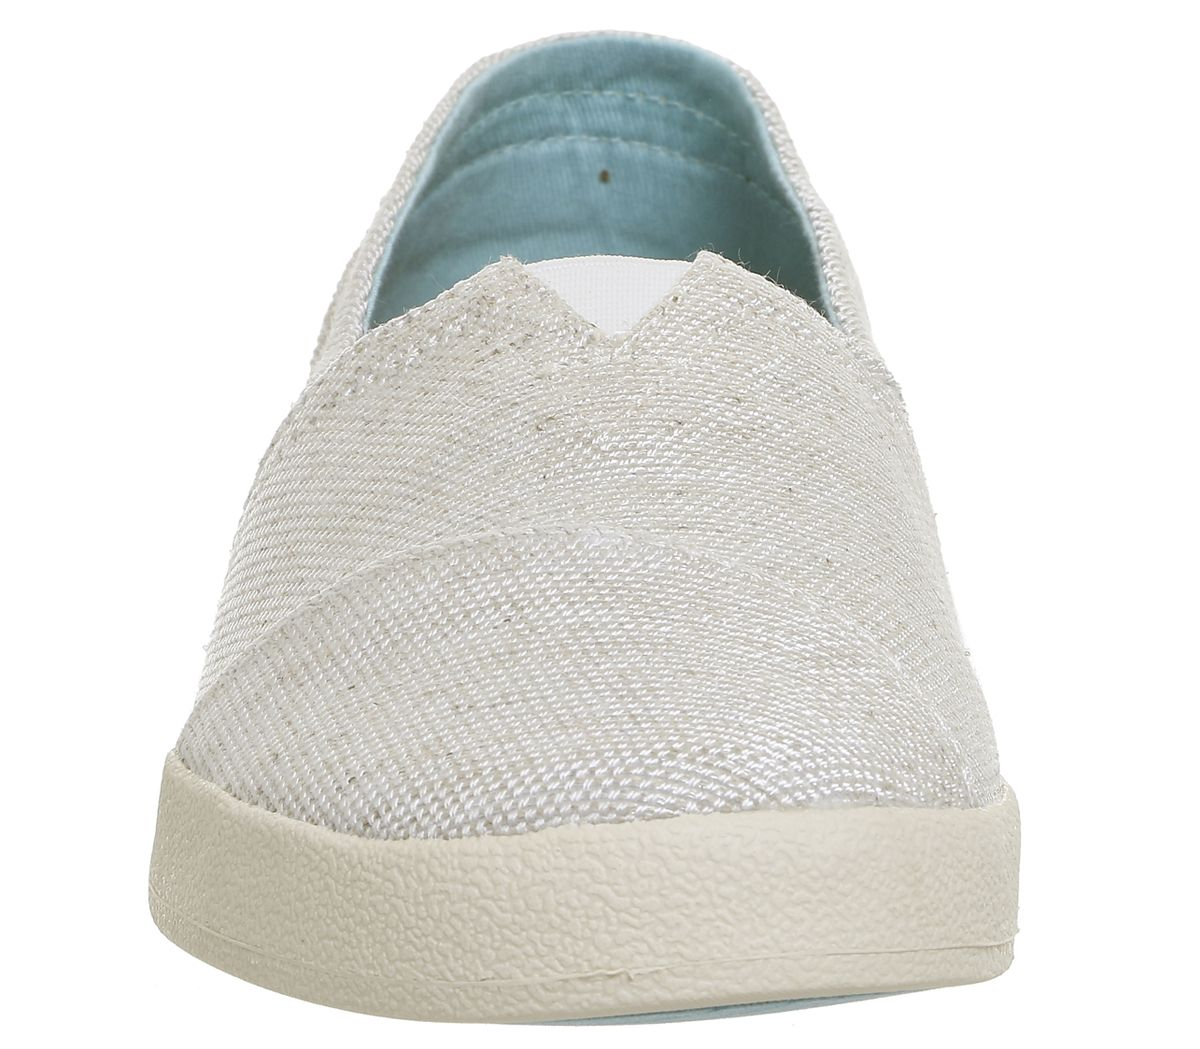 Womens-Toms-Avalon-Sneakers-Natural-Yarn-Dye-Flats thumbnail 10